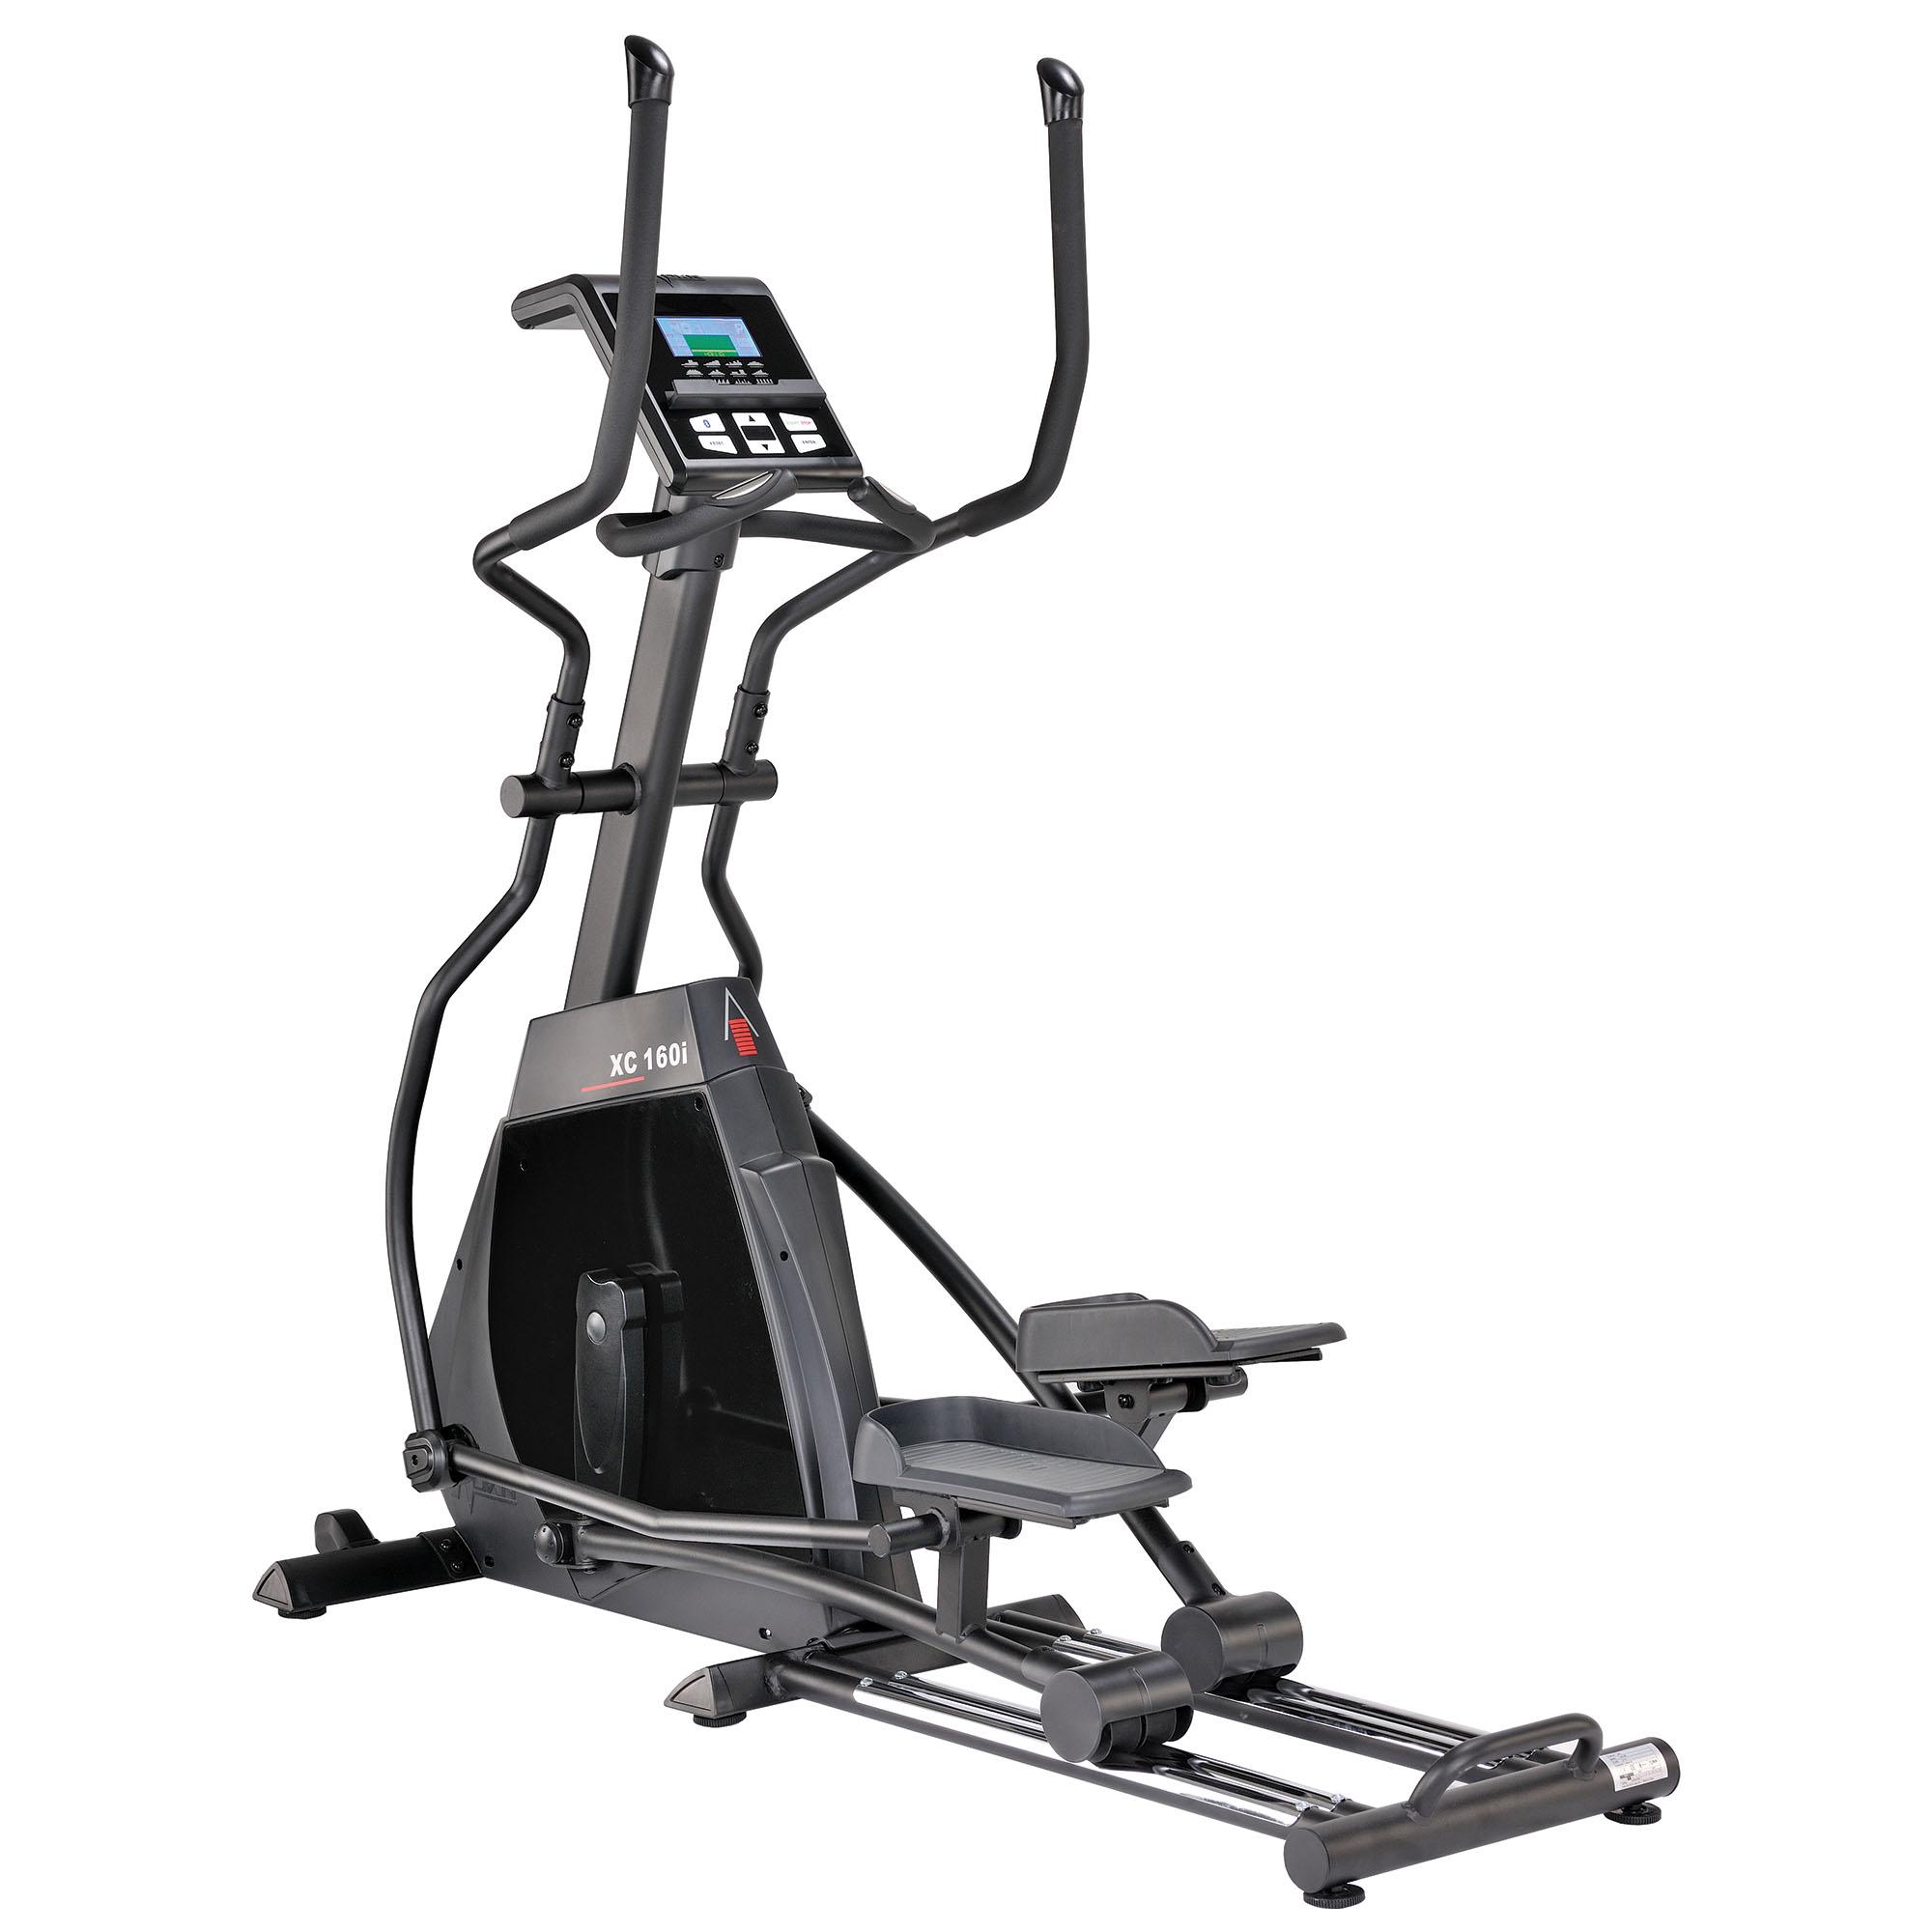 Elliptical Bike Definition: Gear Fitness Magnetic Elliptical Trainer Review 2014